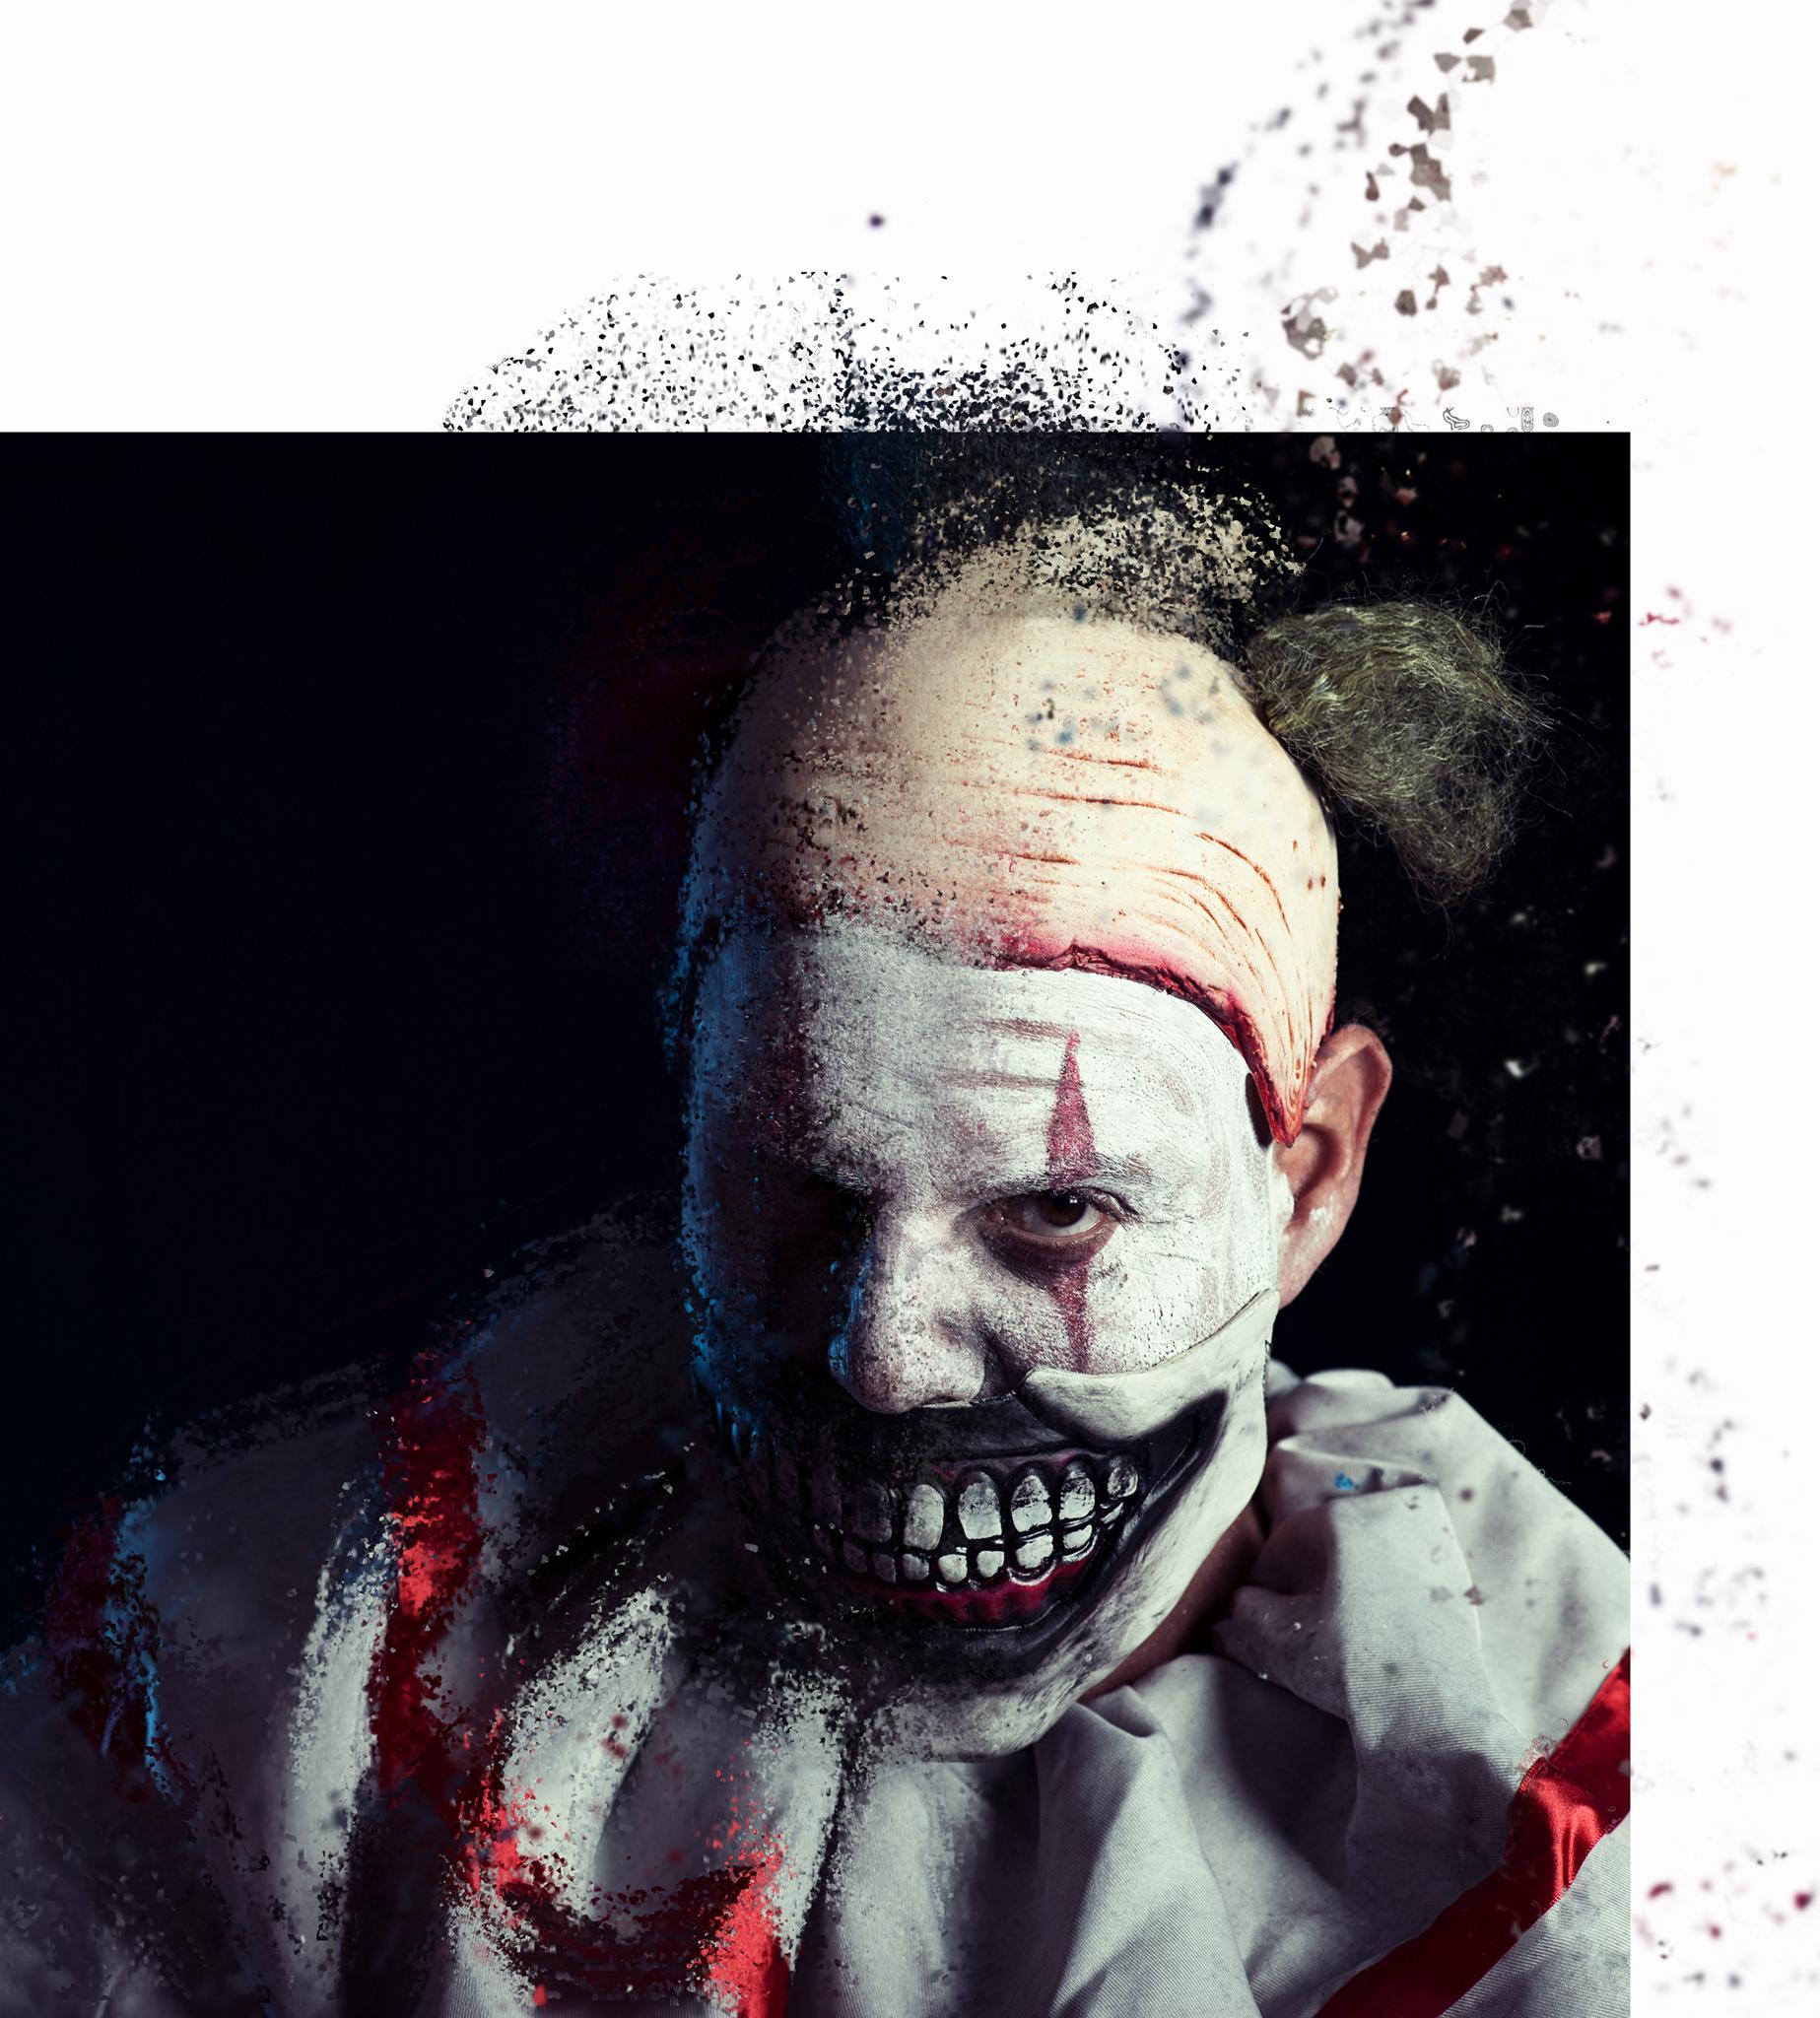 Halloween-567-Edit-web.jpg